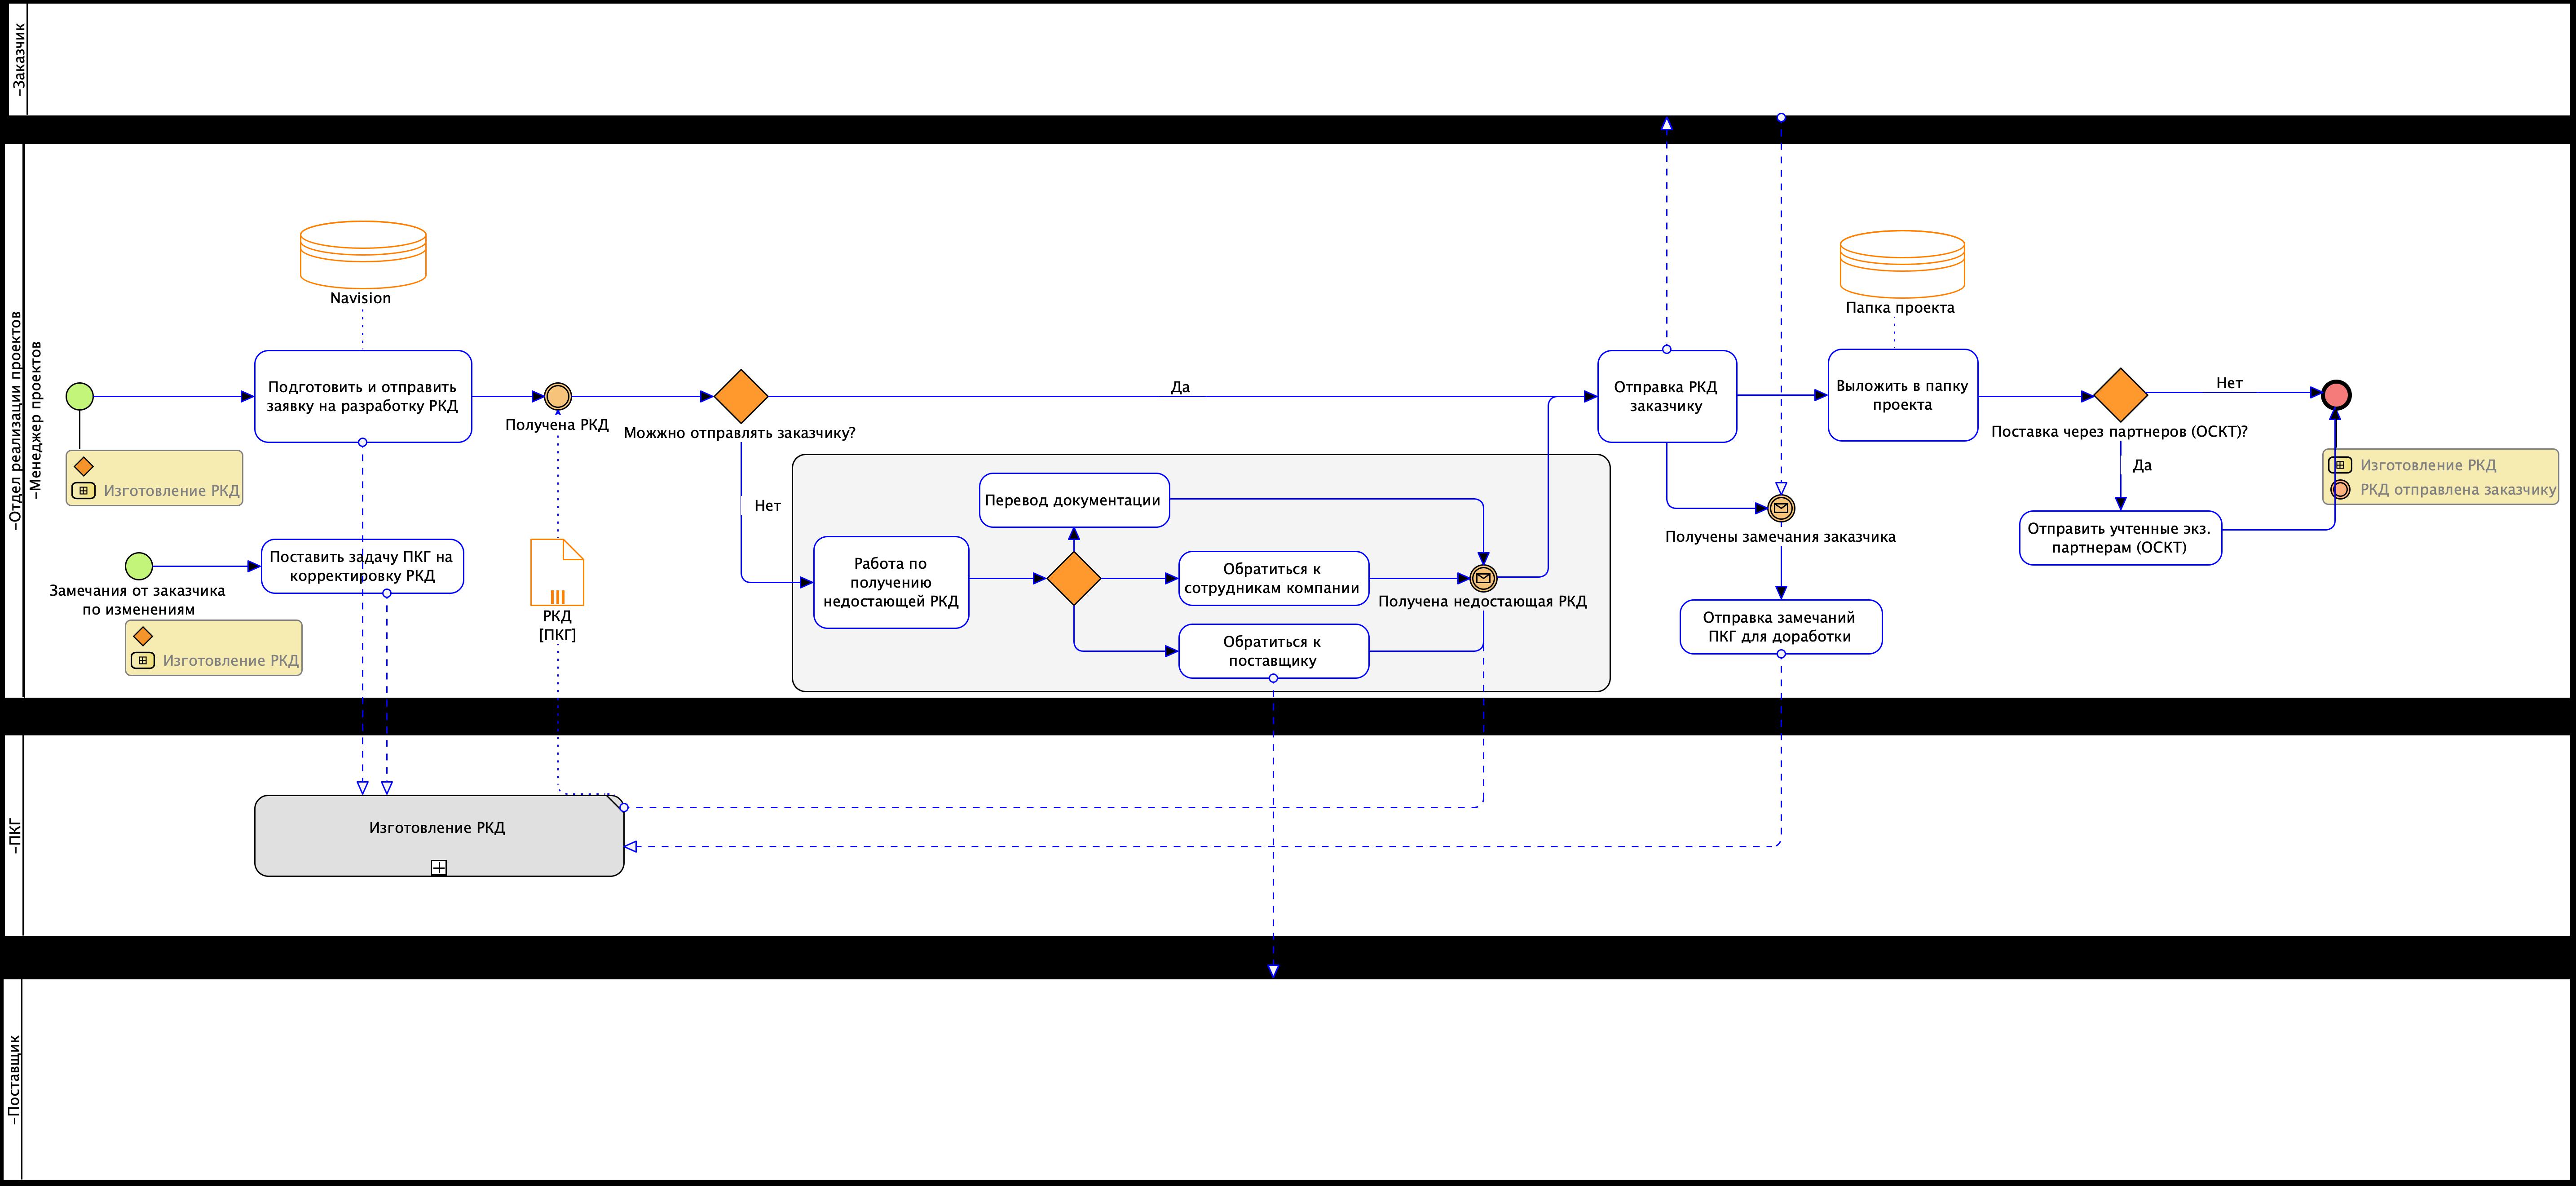 Пример регламента процесса. Диаграмма Заказ РКД